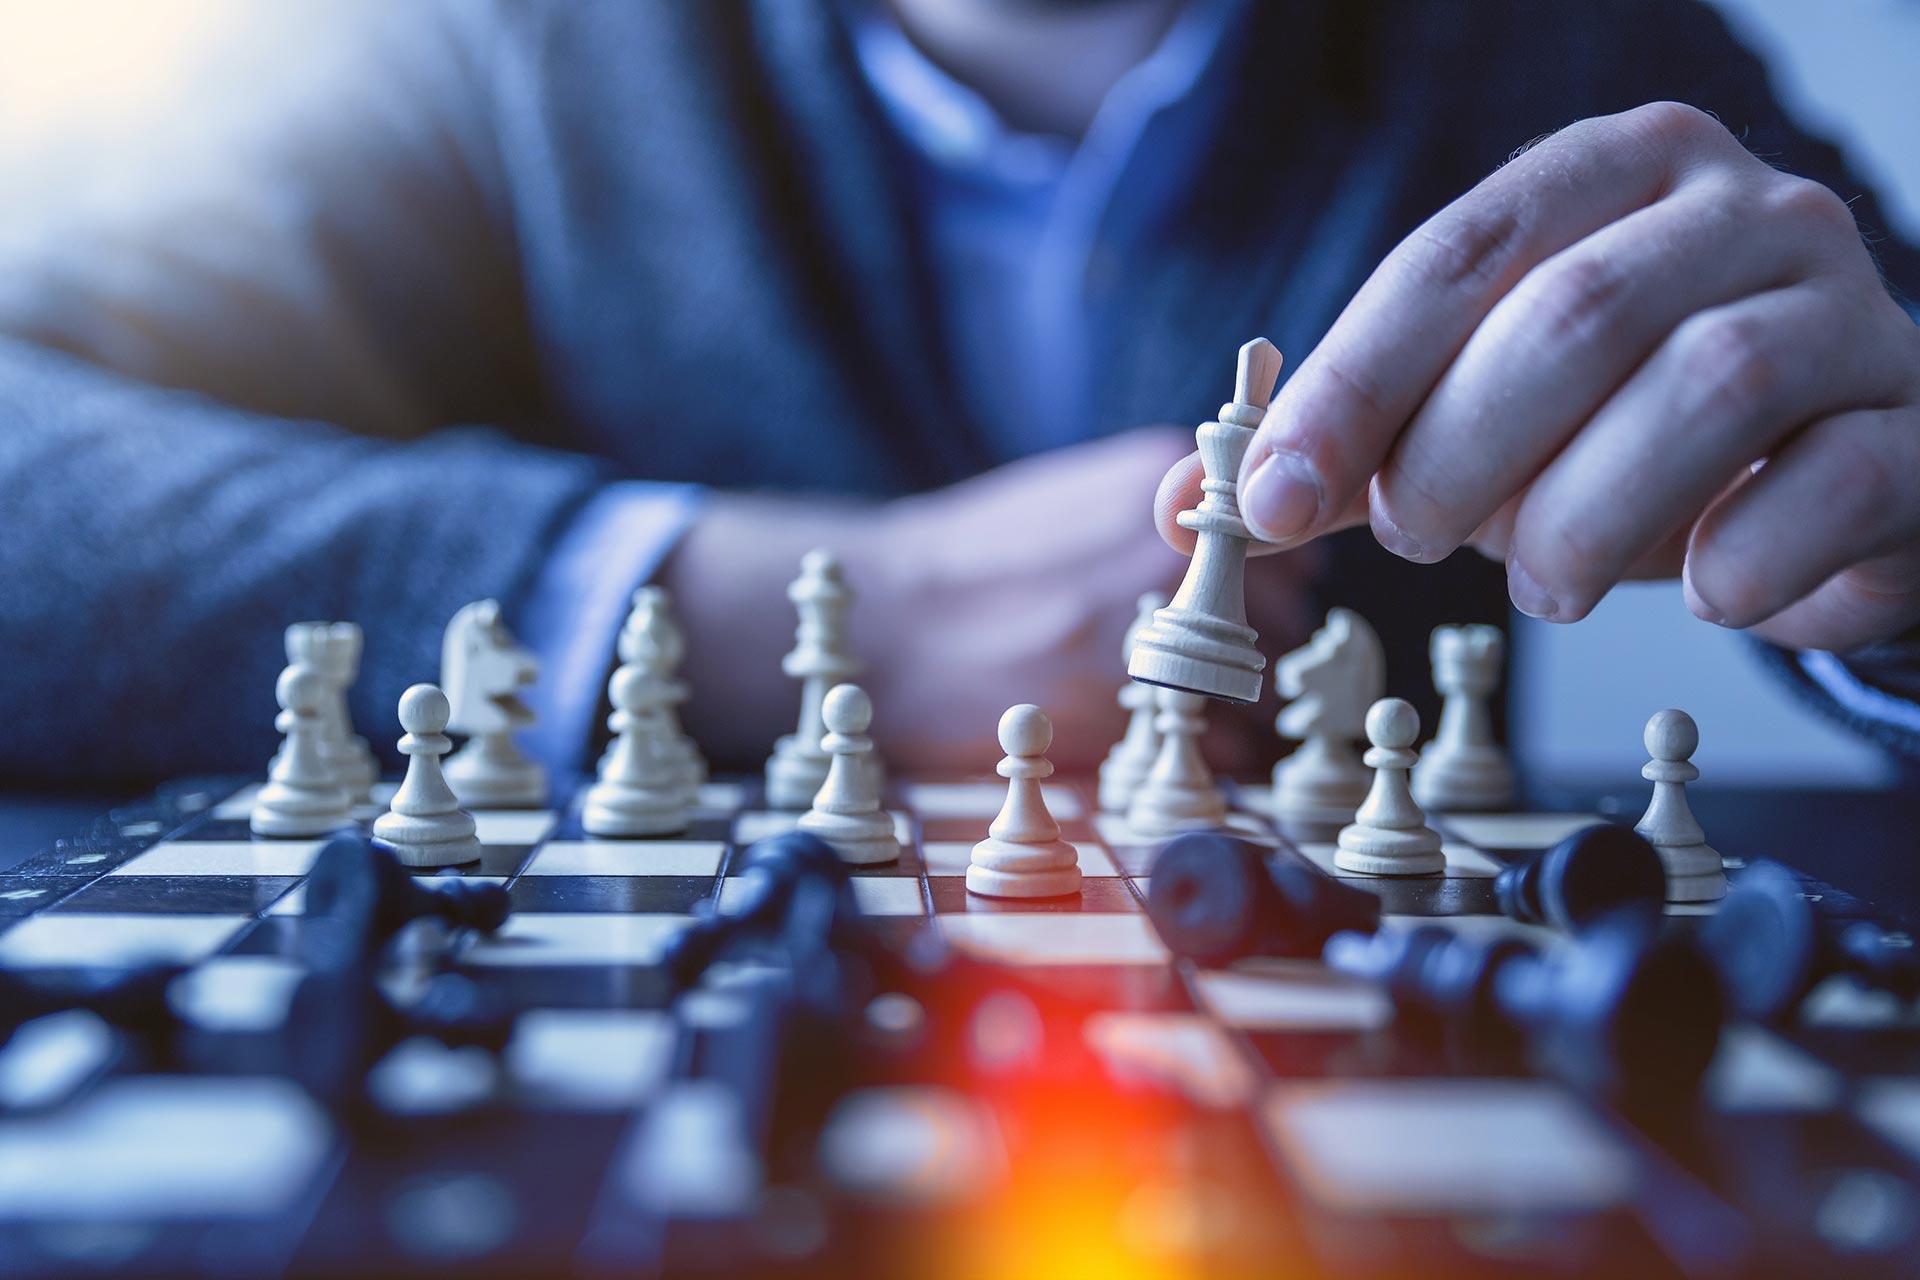 Simultaneas ajedrez